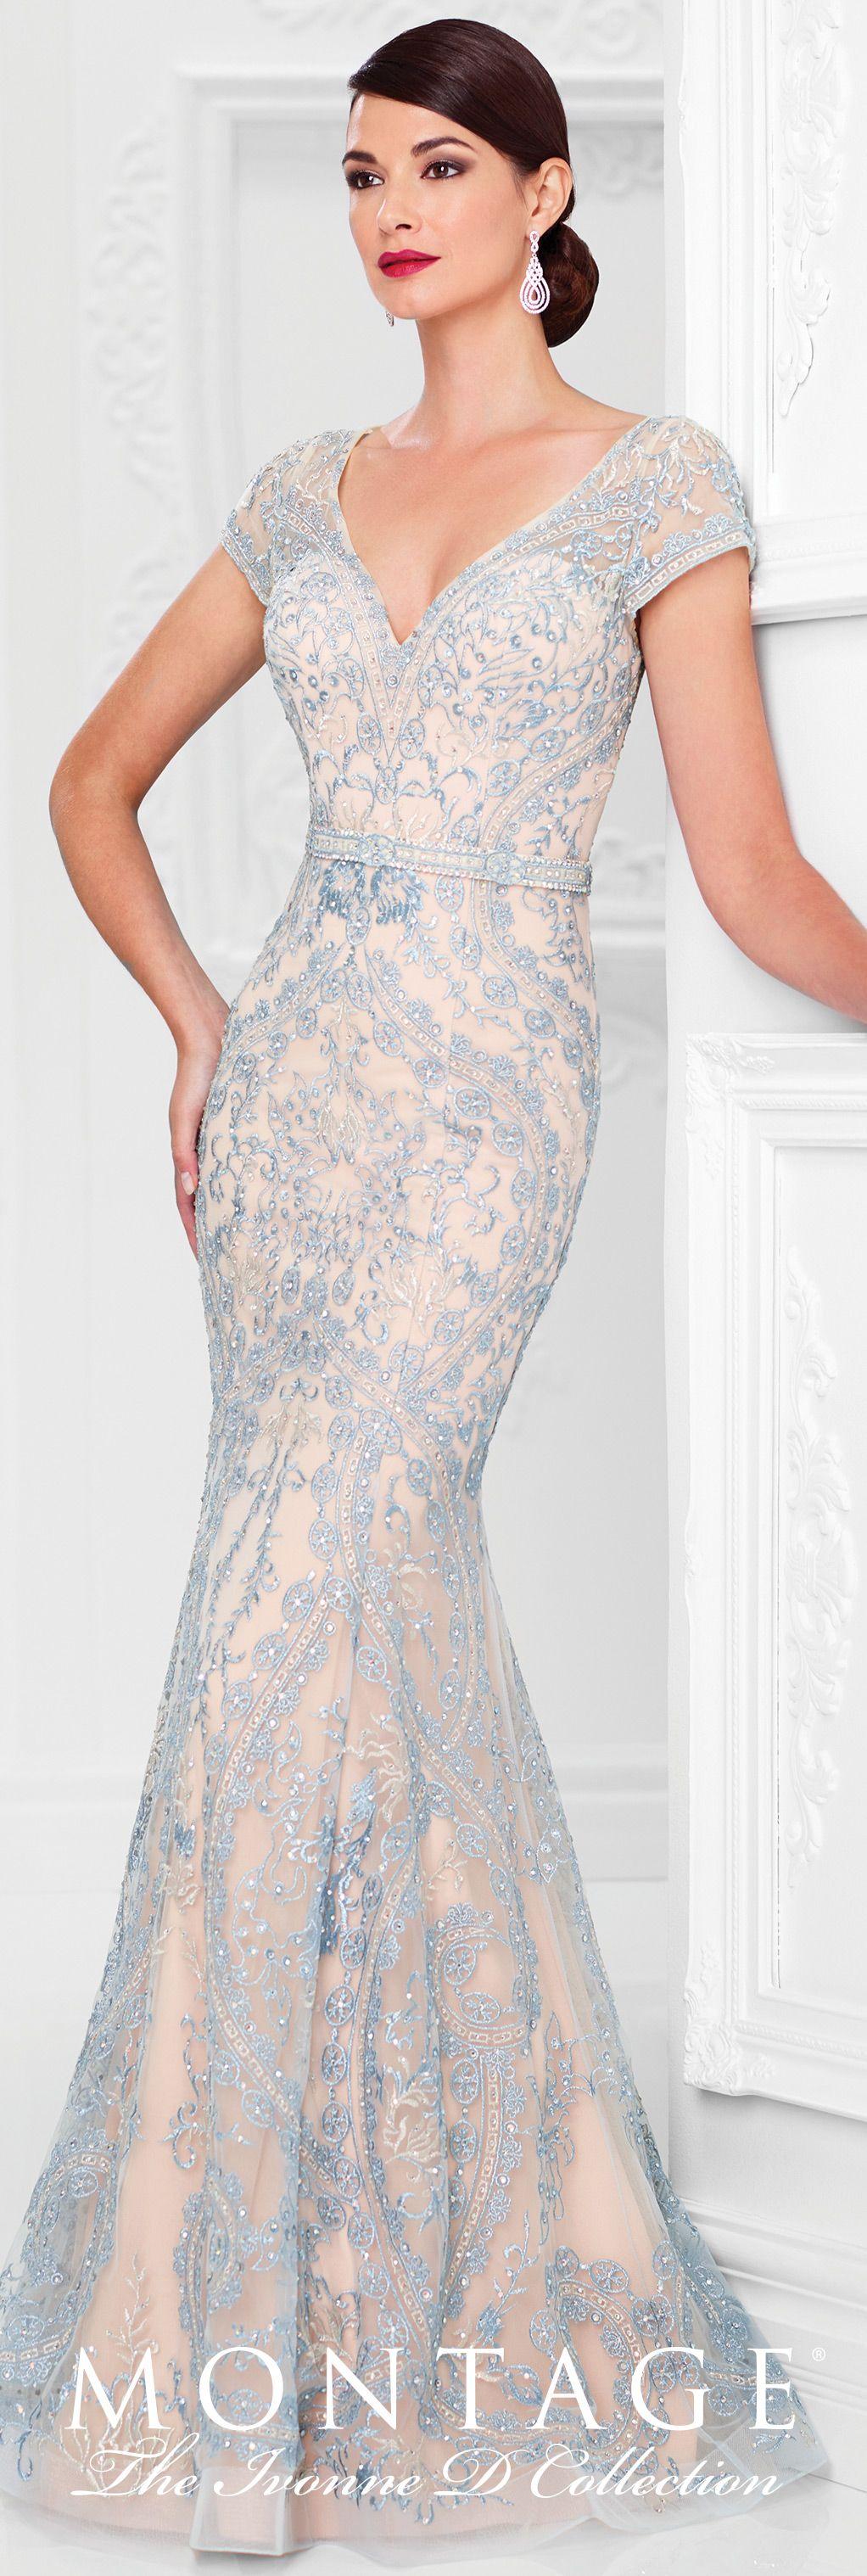 coctail dresses Santa Clarita